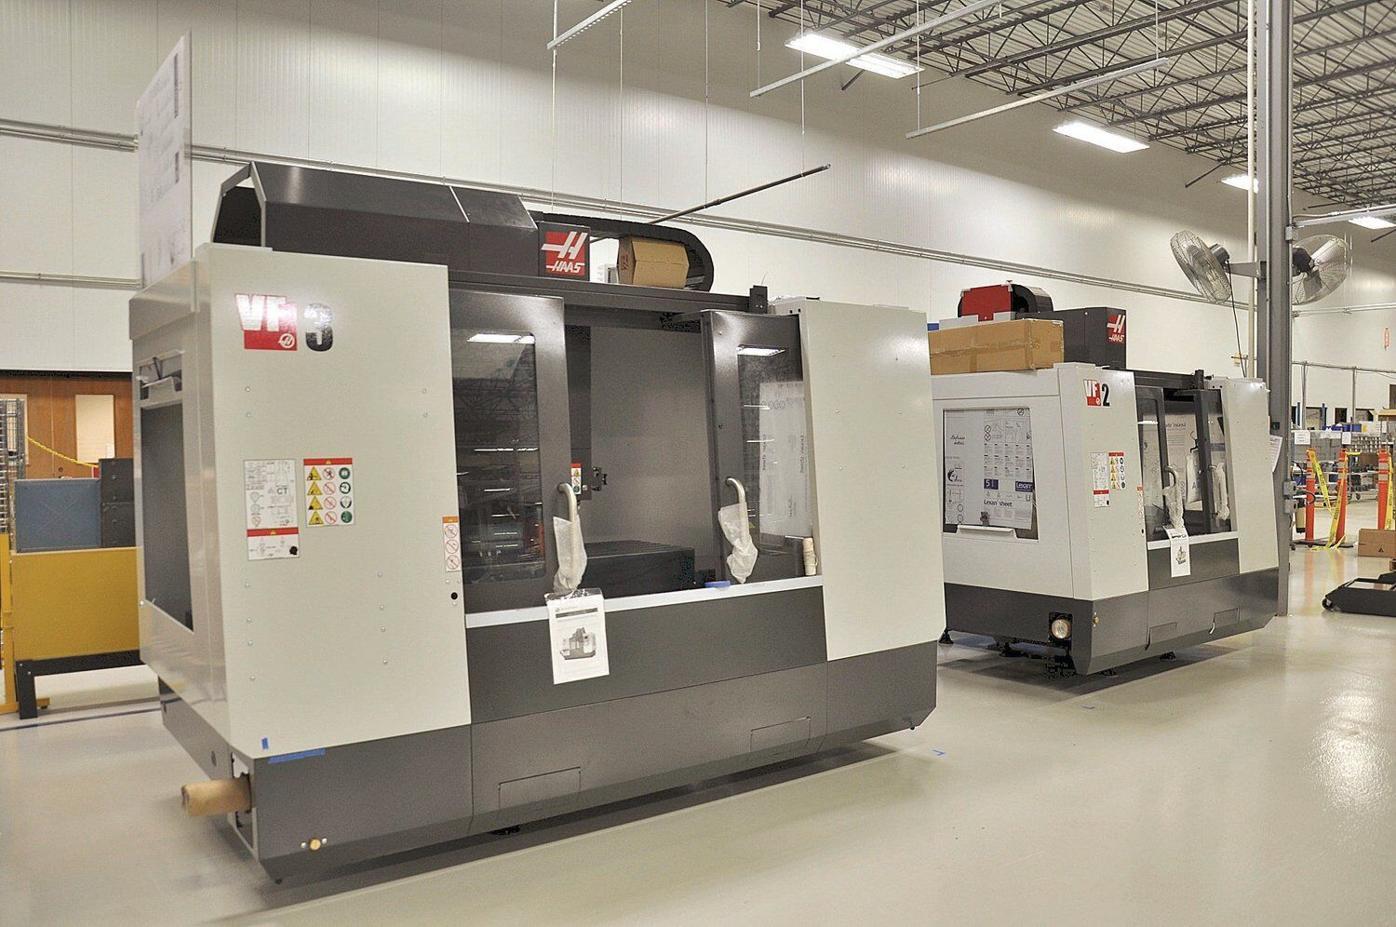 Mack Molding to produce ventilator components